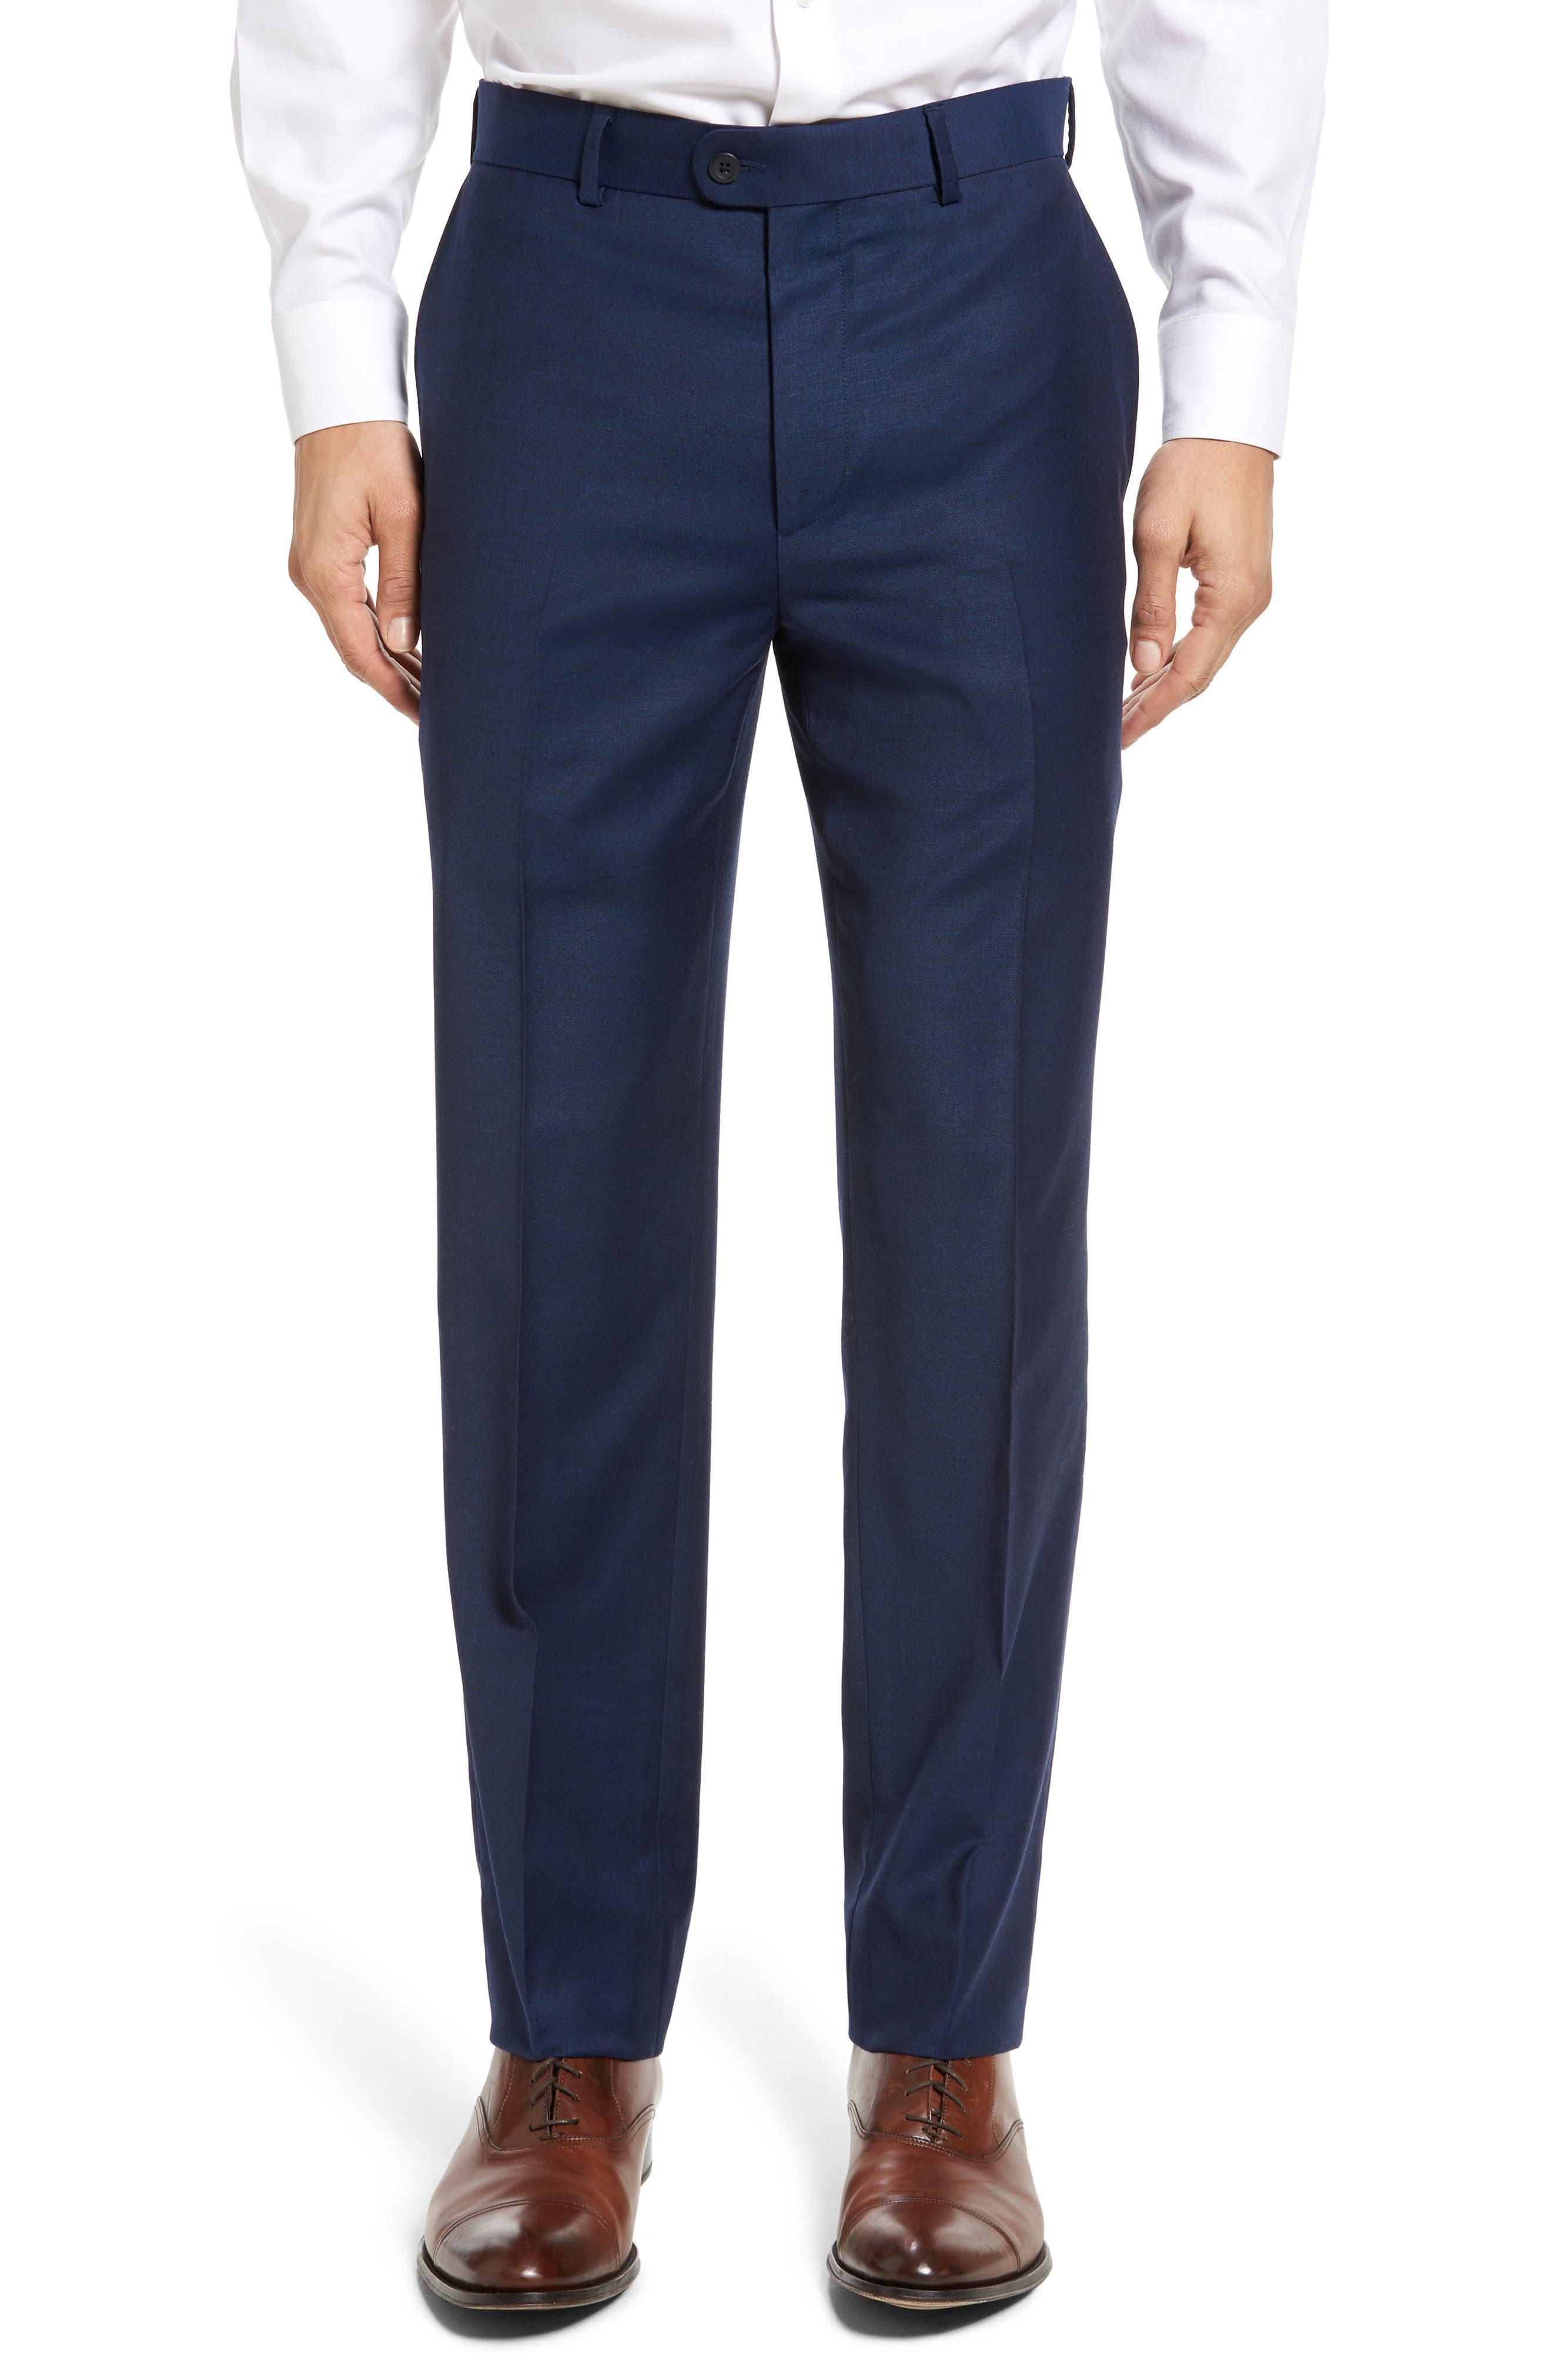 Bensol Gab Trim Fit Flat Front Pants